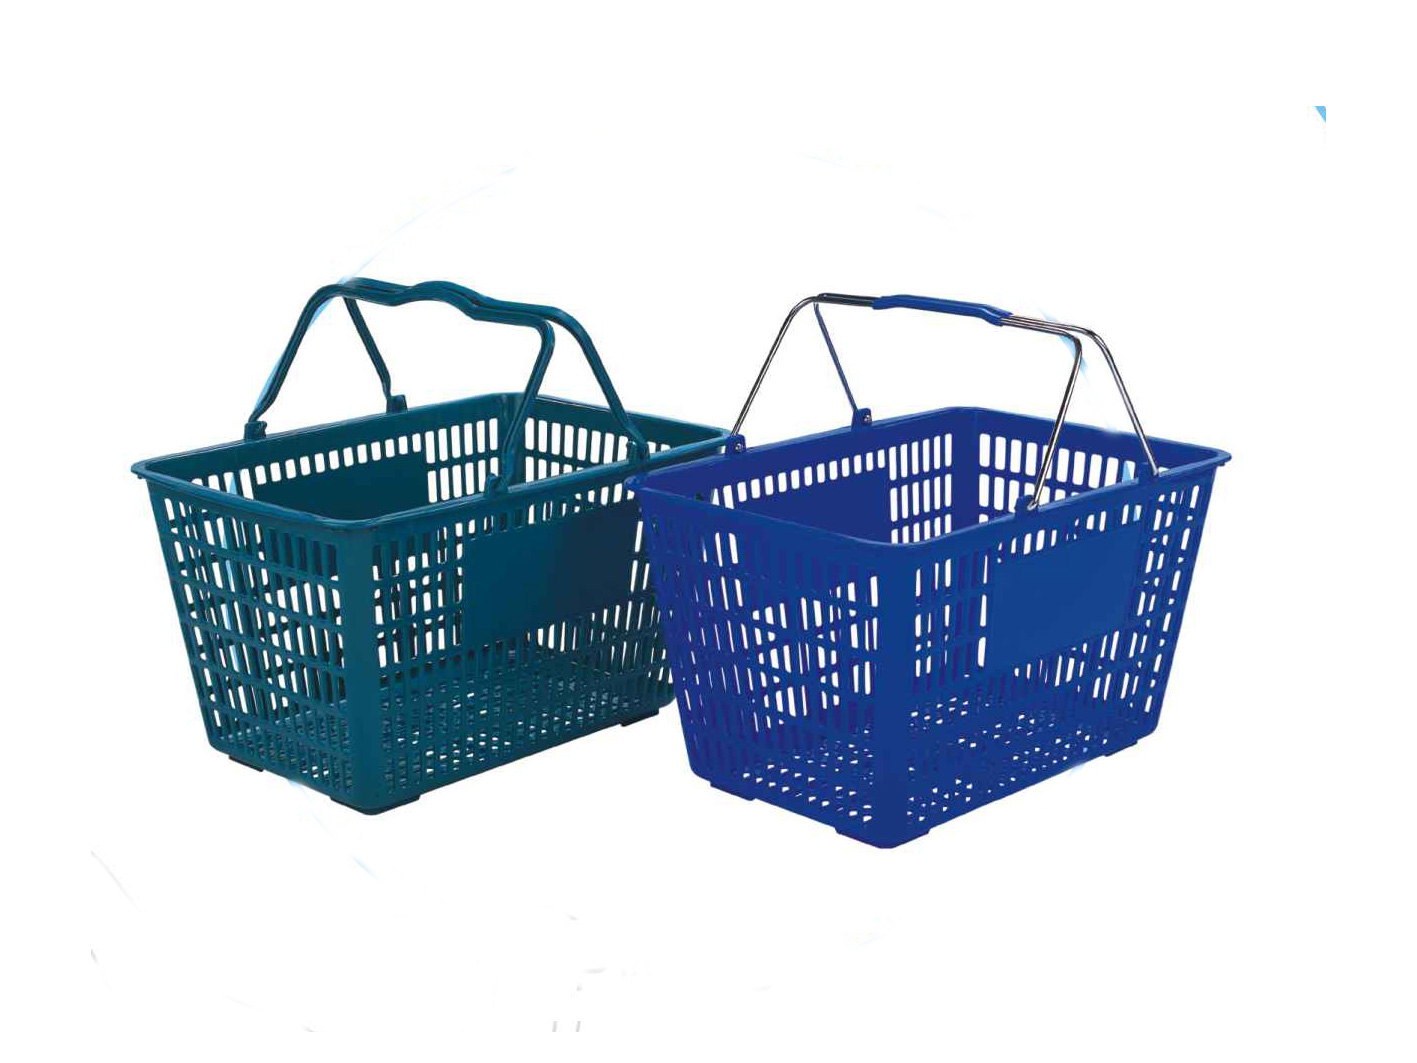 pw605 塑料购物篮